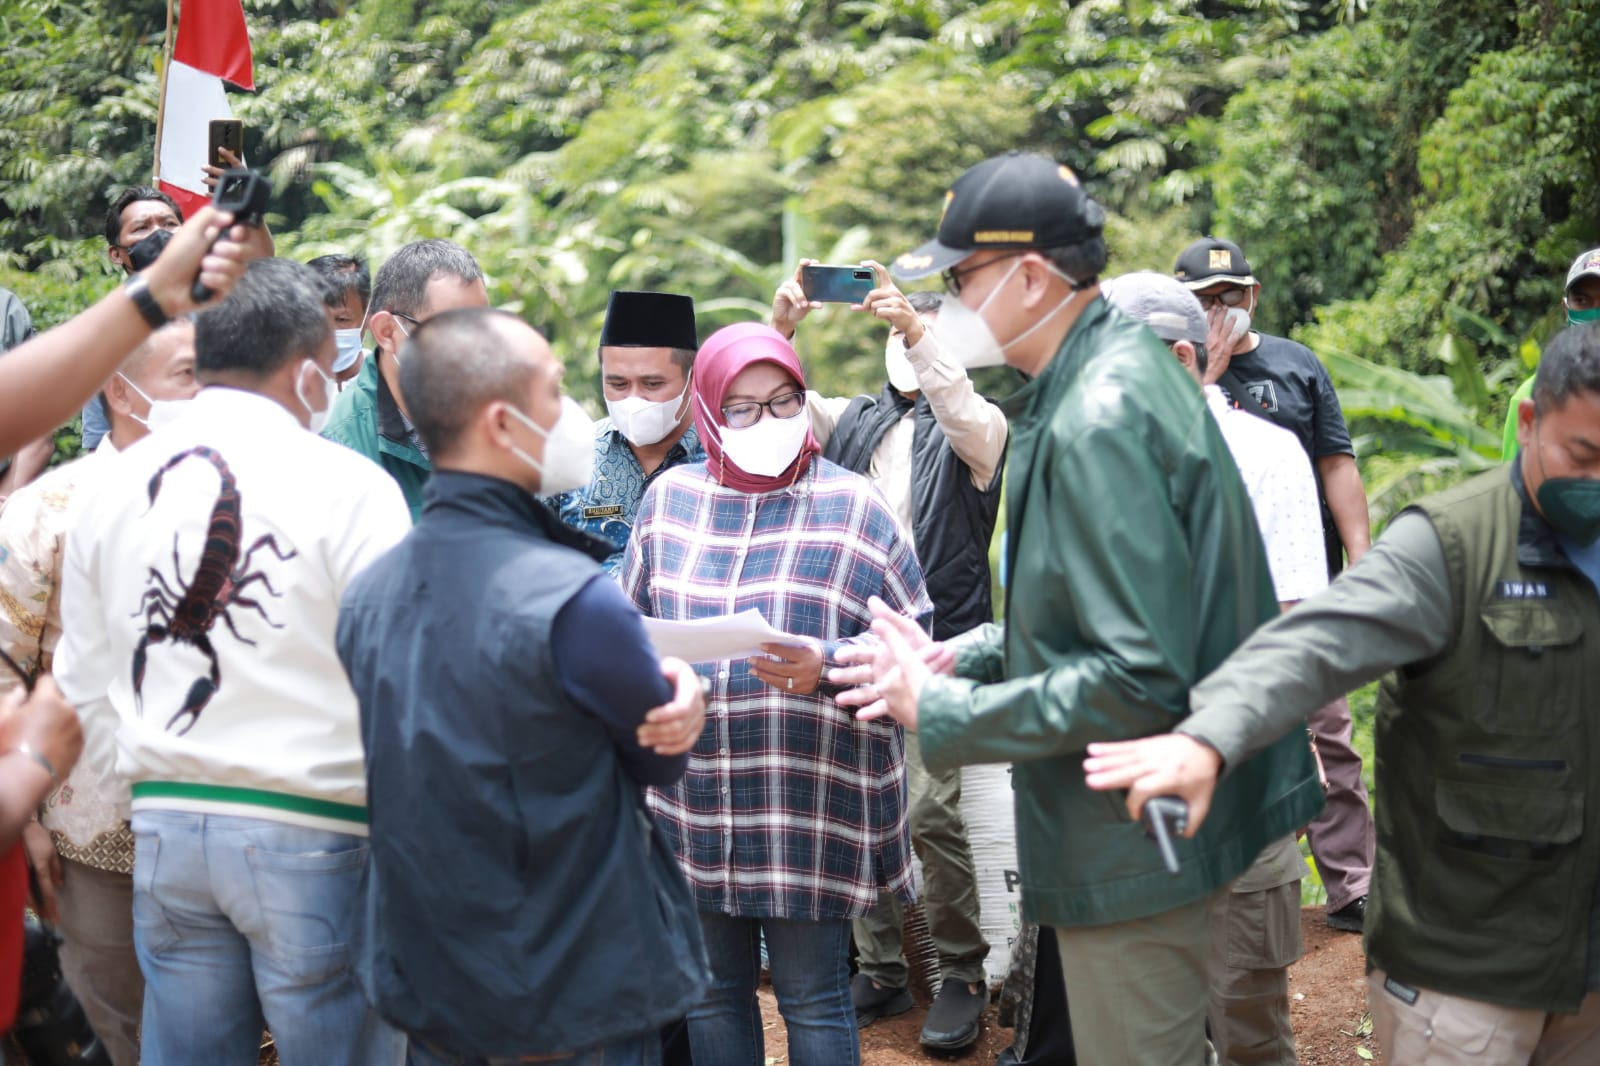 Dorong Realisasikan Jalur Puncak 2 Bupati Bogor Bersama Forkopimda dan Komisi V DPR RI Tinjau Lokasi